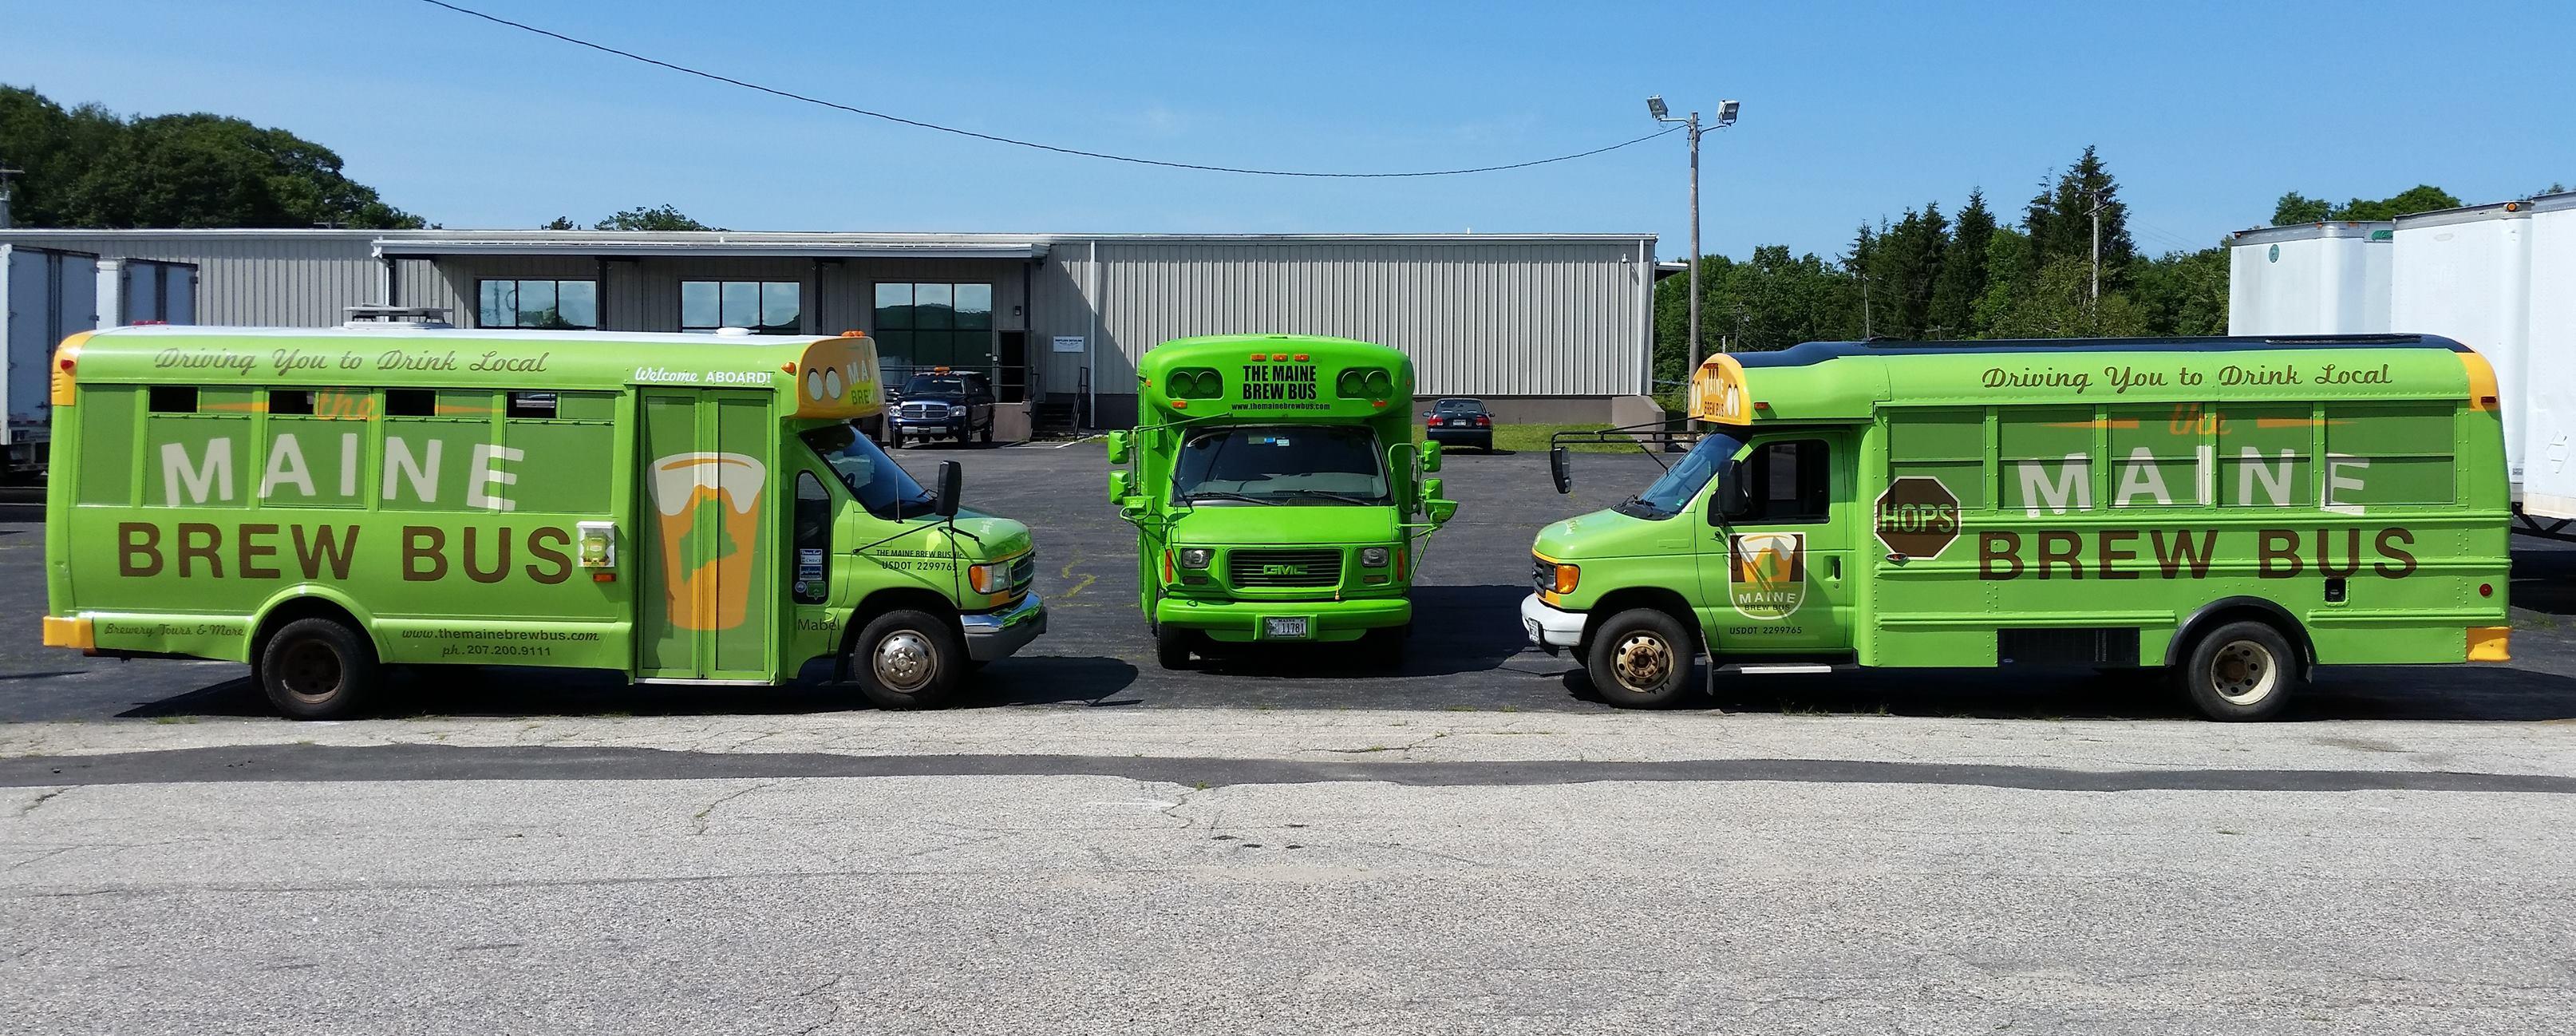 Maine Brew Bus Tour